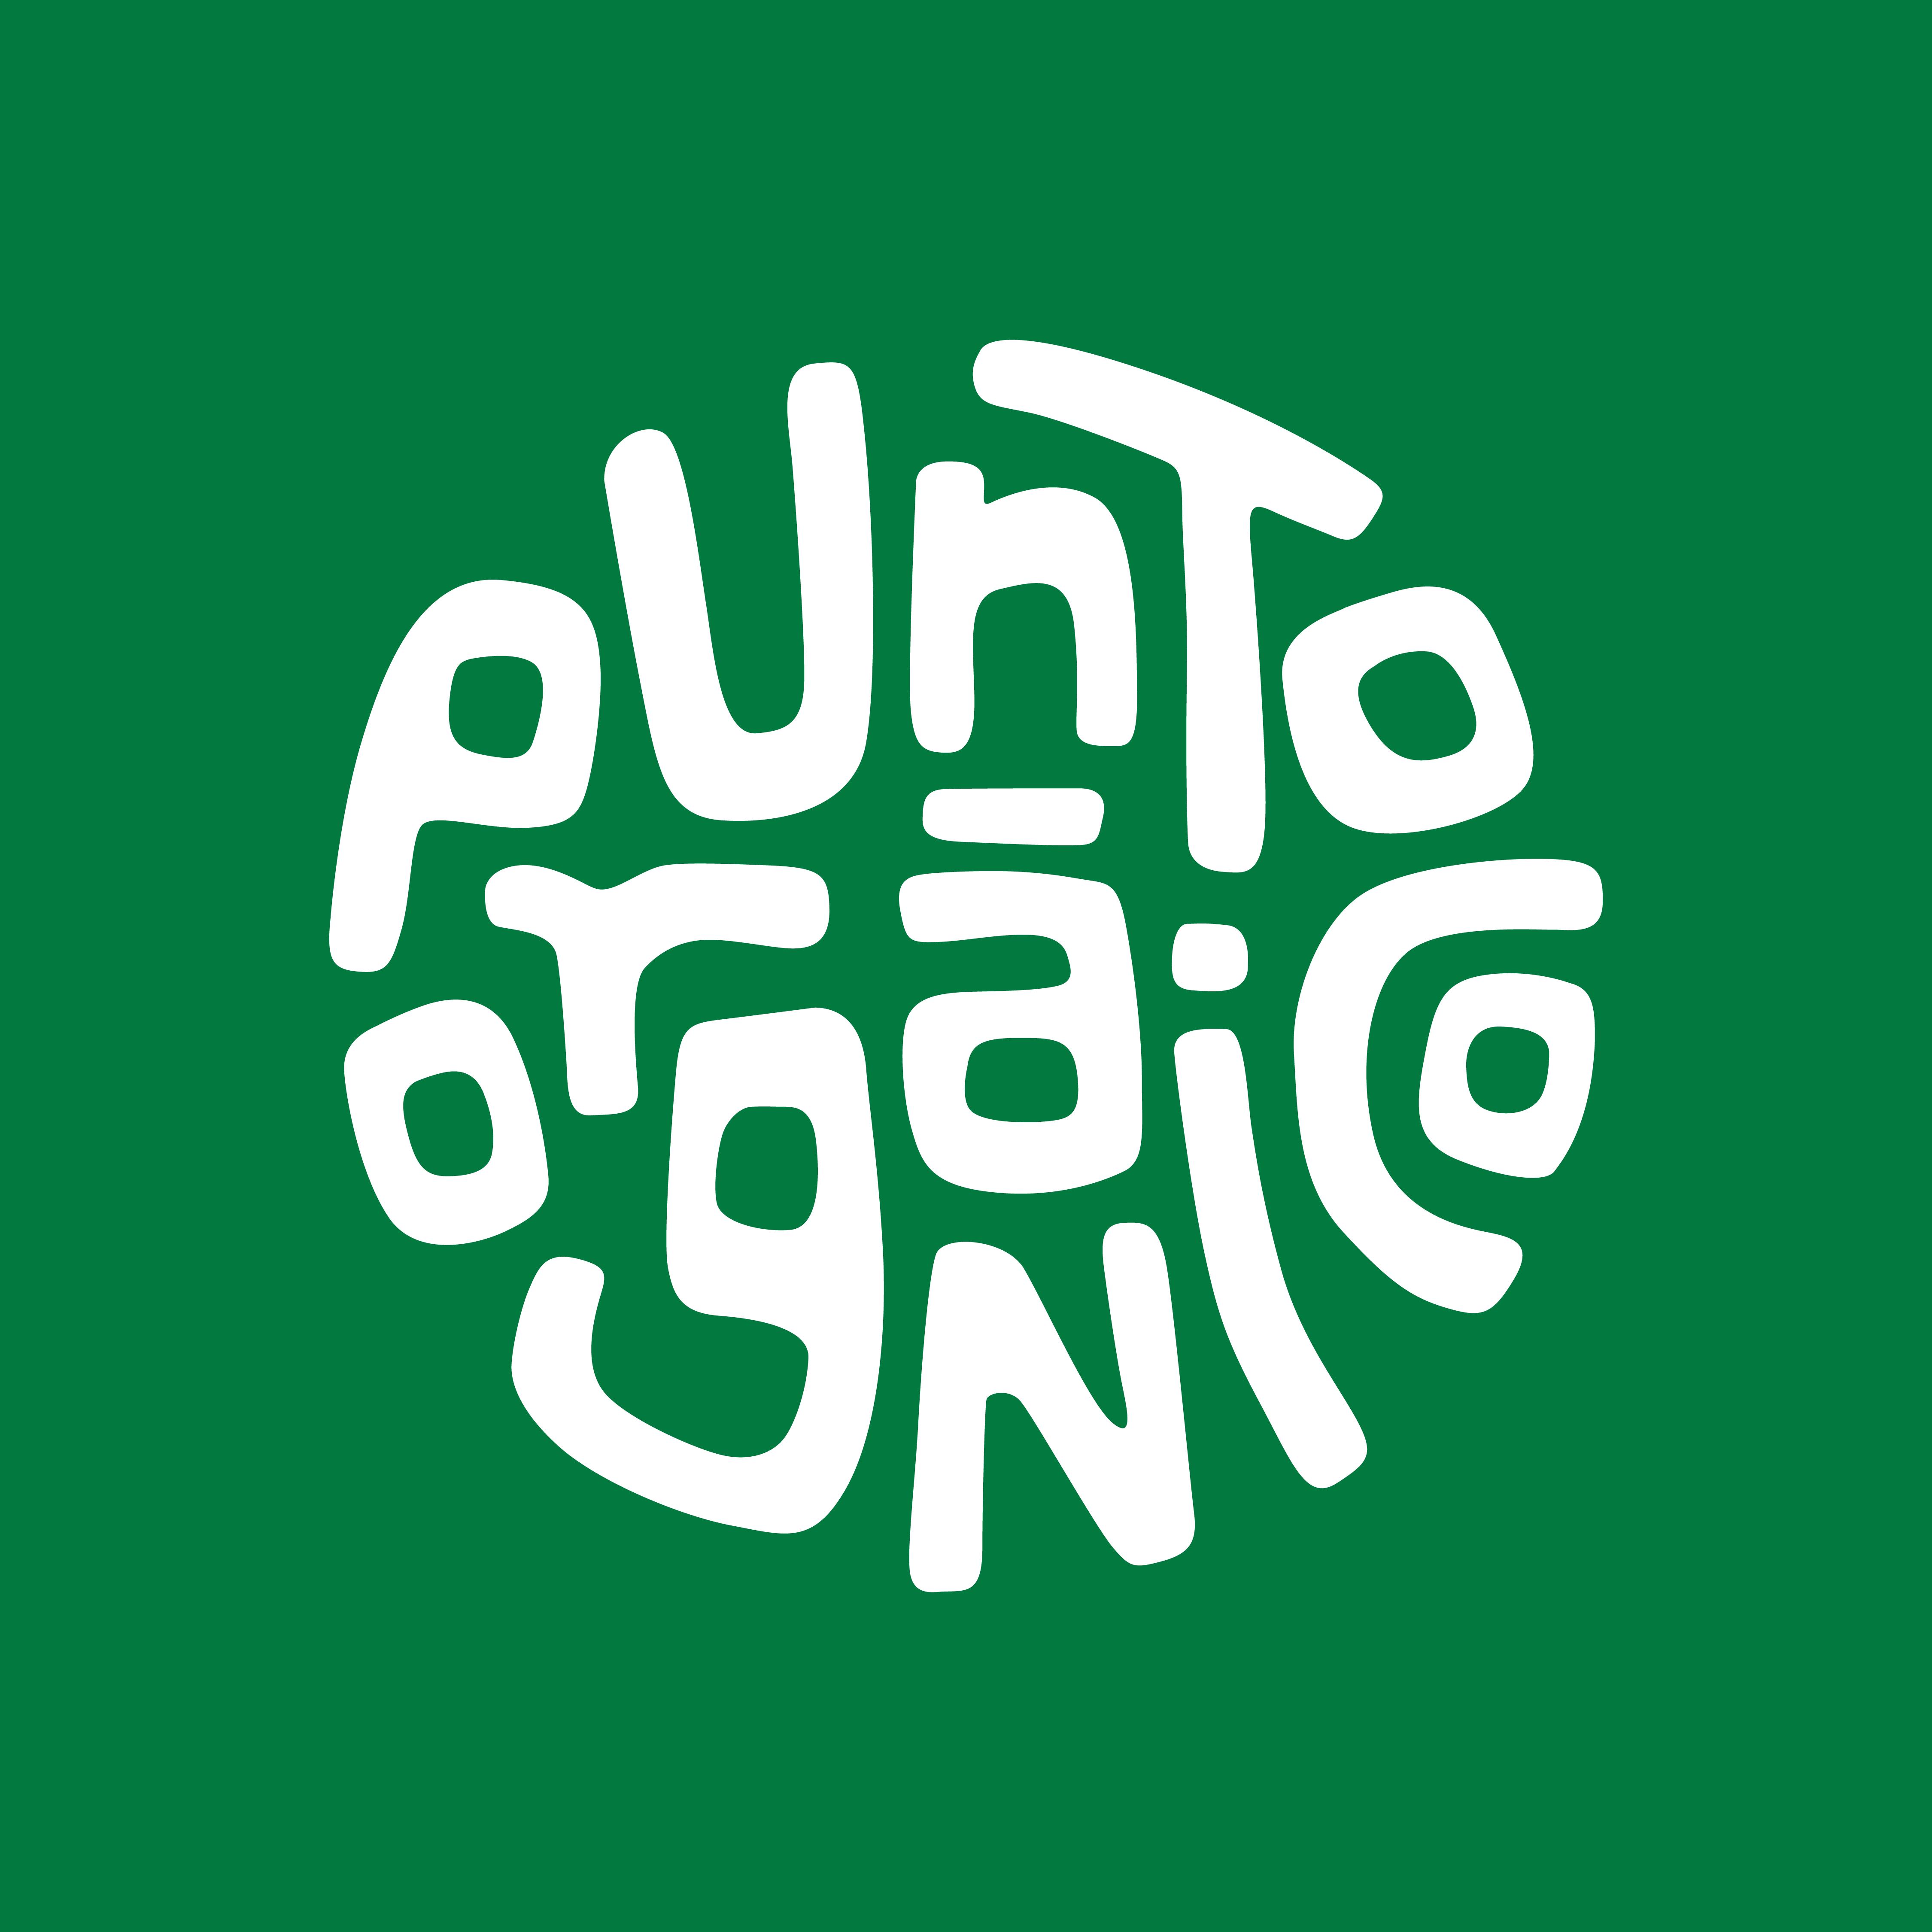 Punto Organico Organic Spot Designer Amanda Hirakata Firm Infinito Peru Year 2010 Organicspot Ama Graphic Design Logo History Logo Typographic Logo